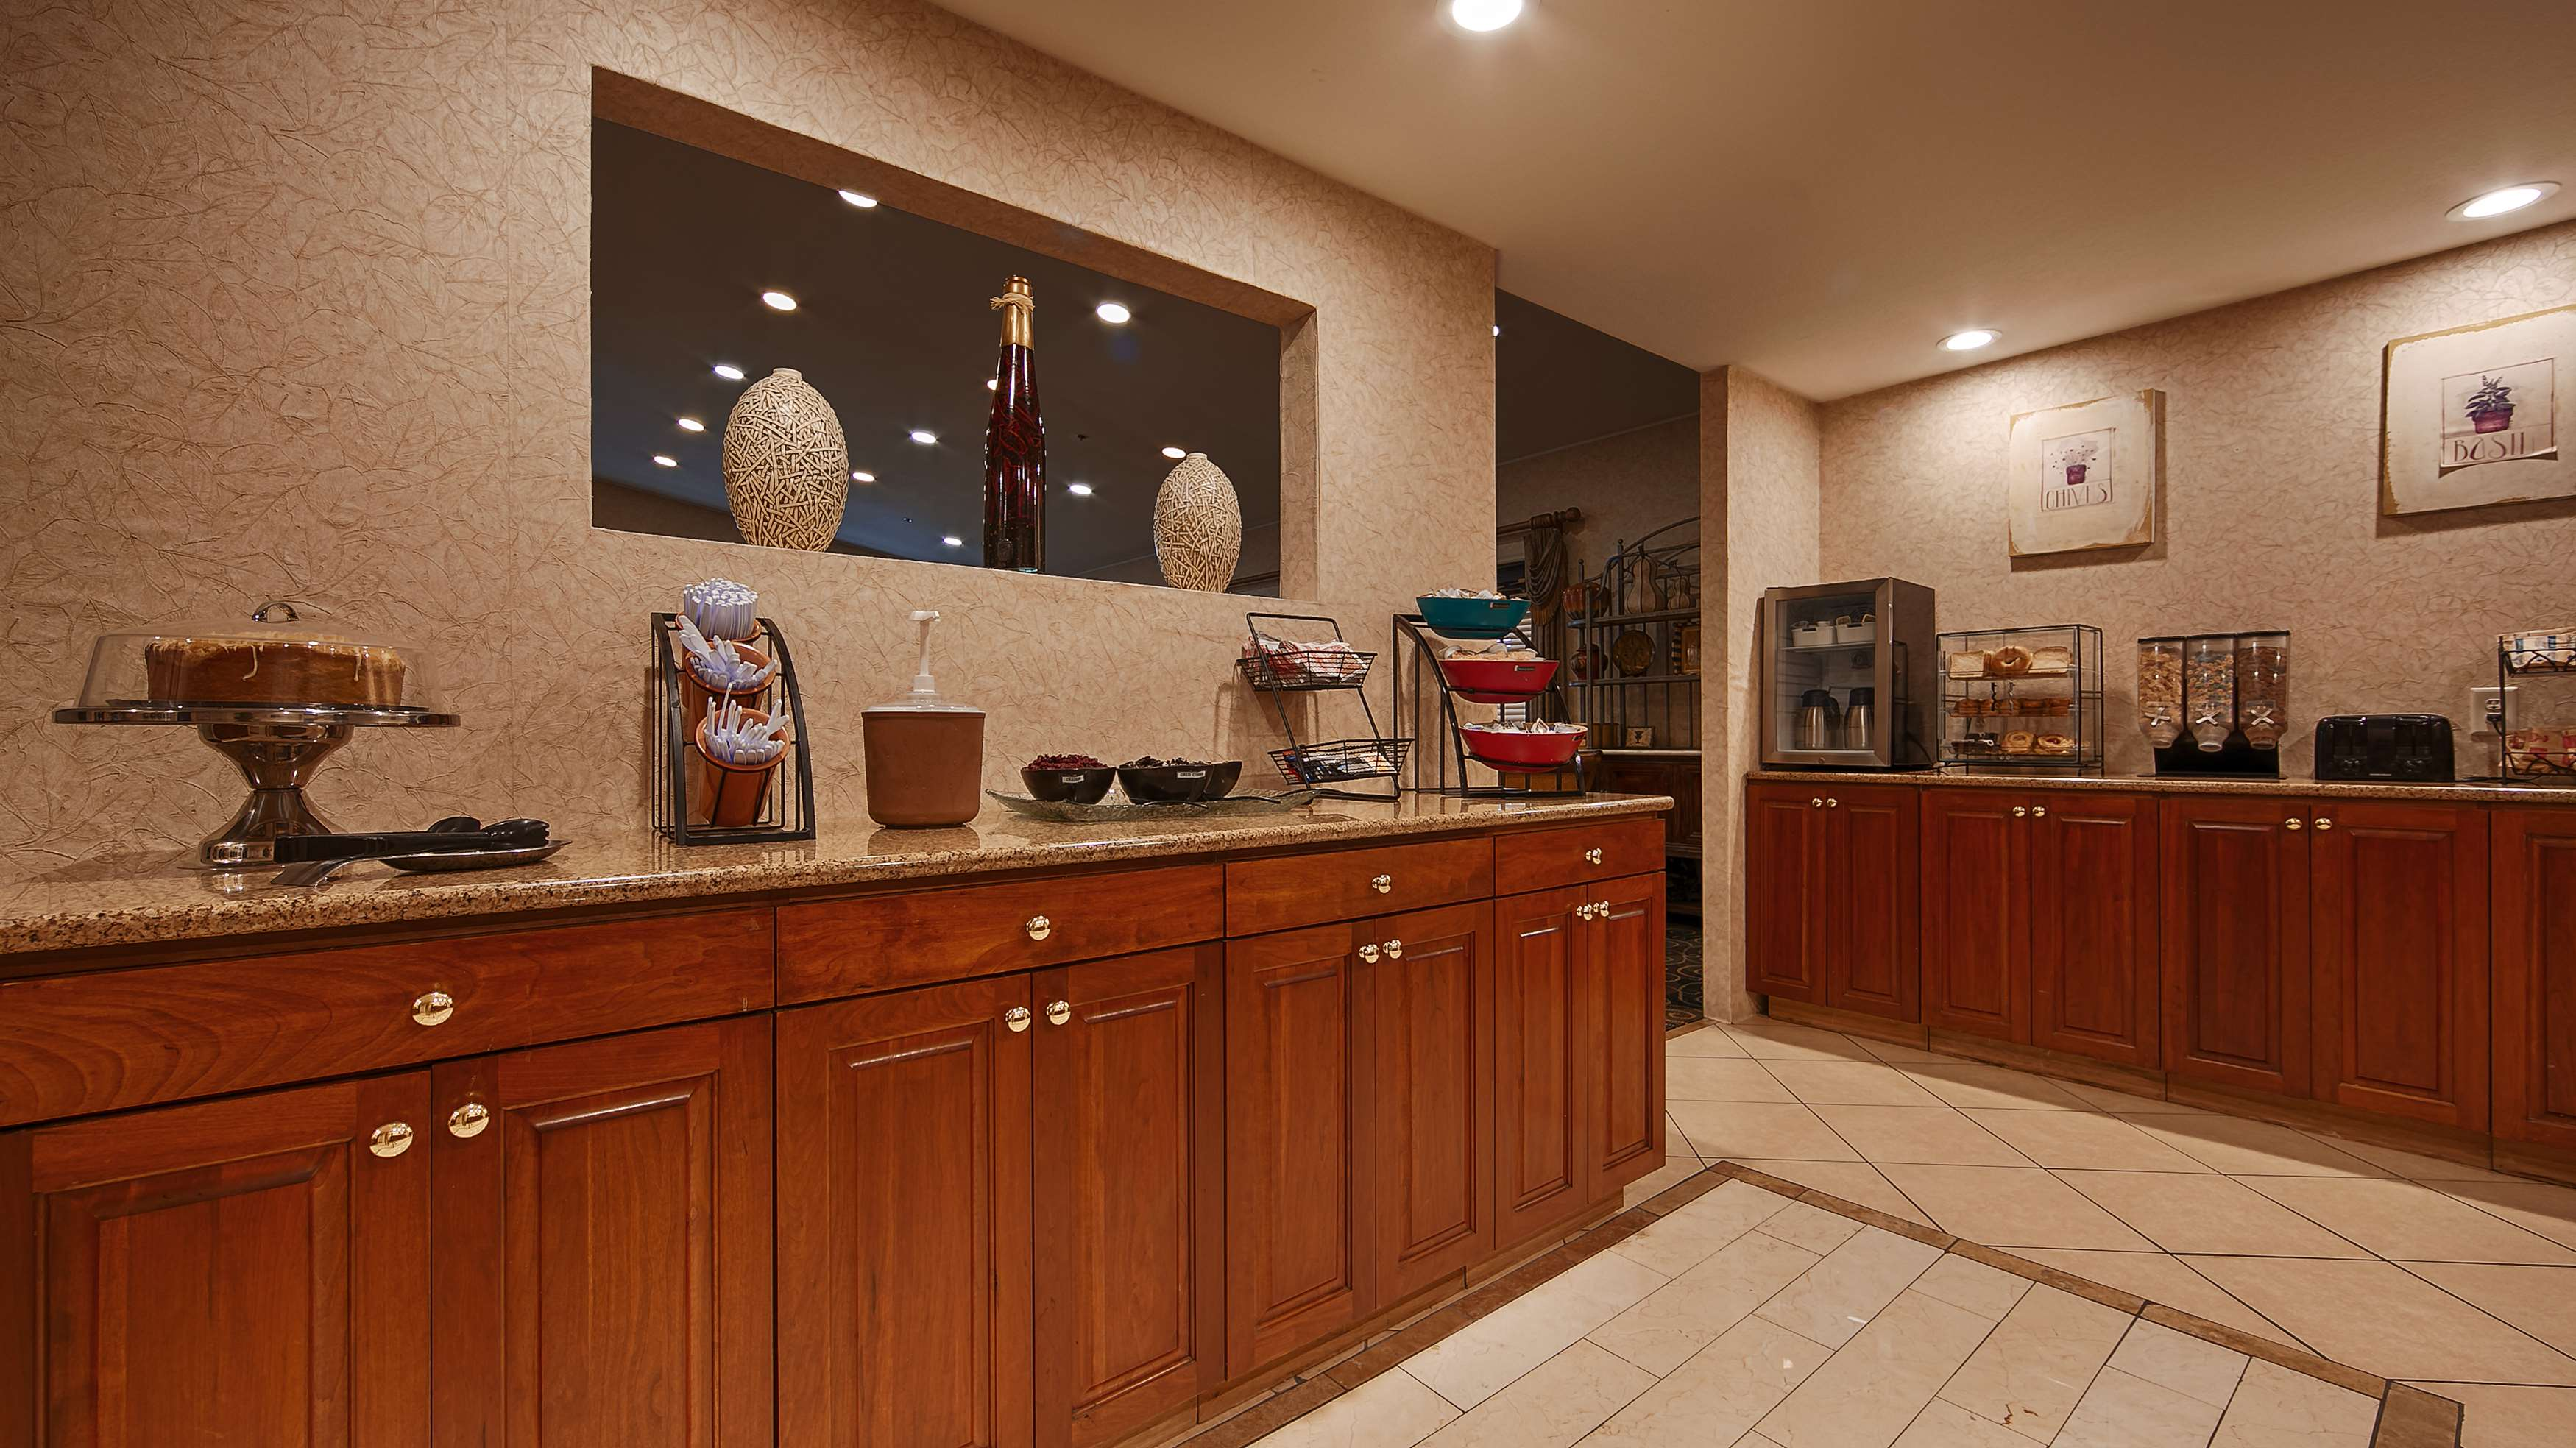 Best Western Plus Bessemer Hotel & Suites image 37